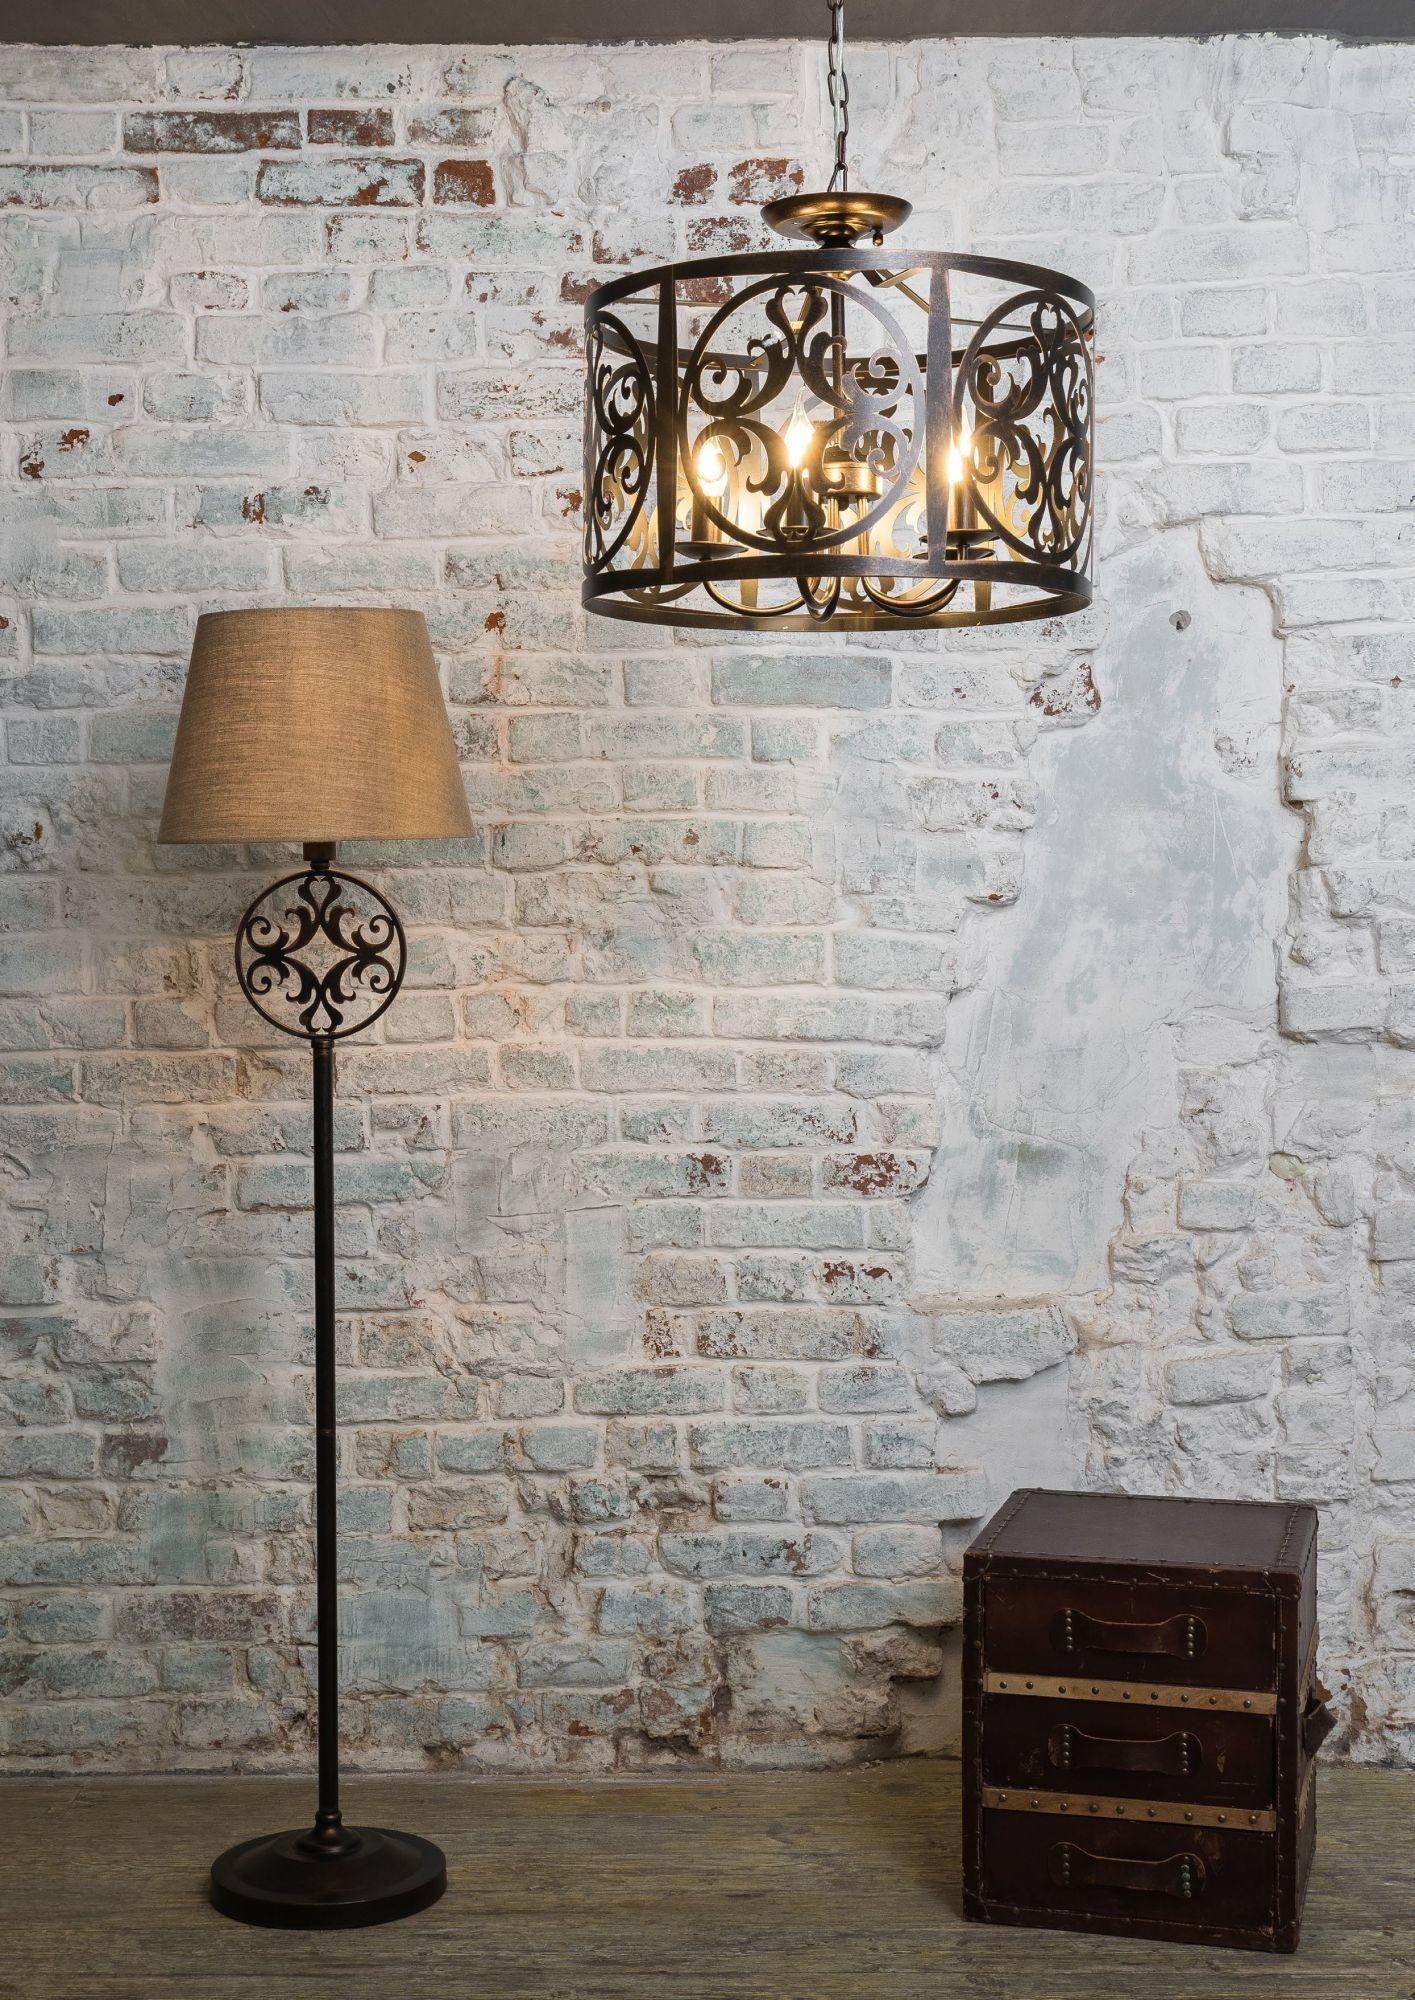 Подвесная люстра Maytoni Rustika H899-05-R, 5xE14x60W, коричневый, металл, ковка - фото 5